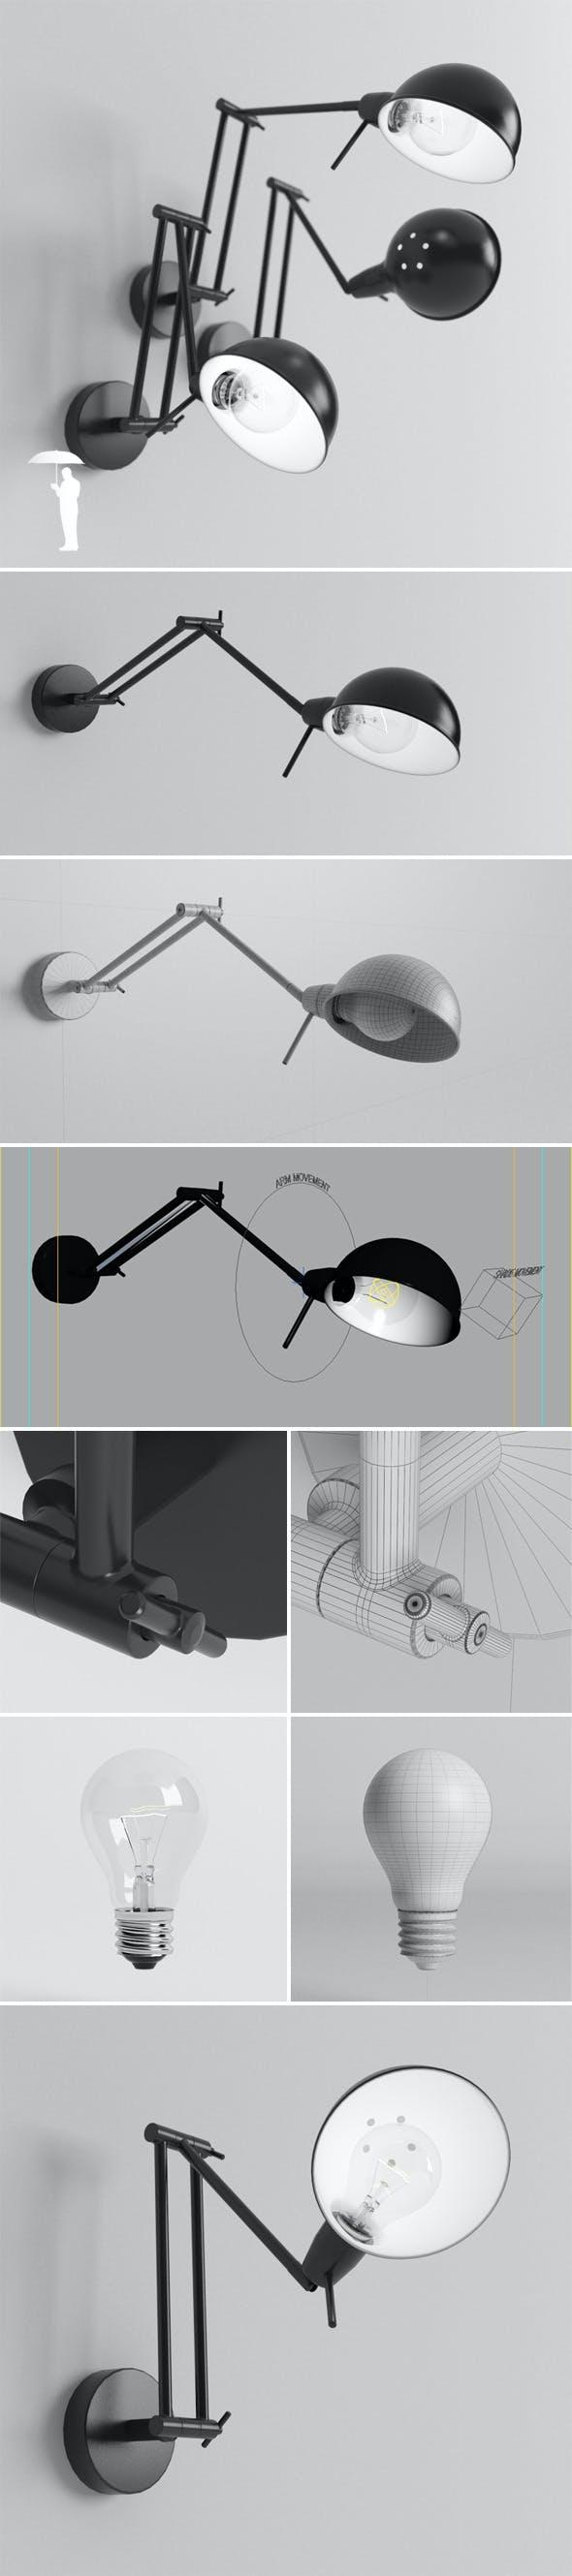 Glasgow lamp plus bulb - 3DOcean Item for Sale